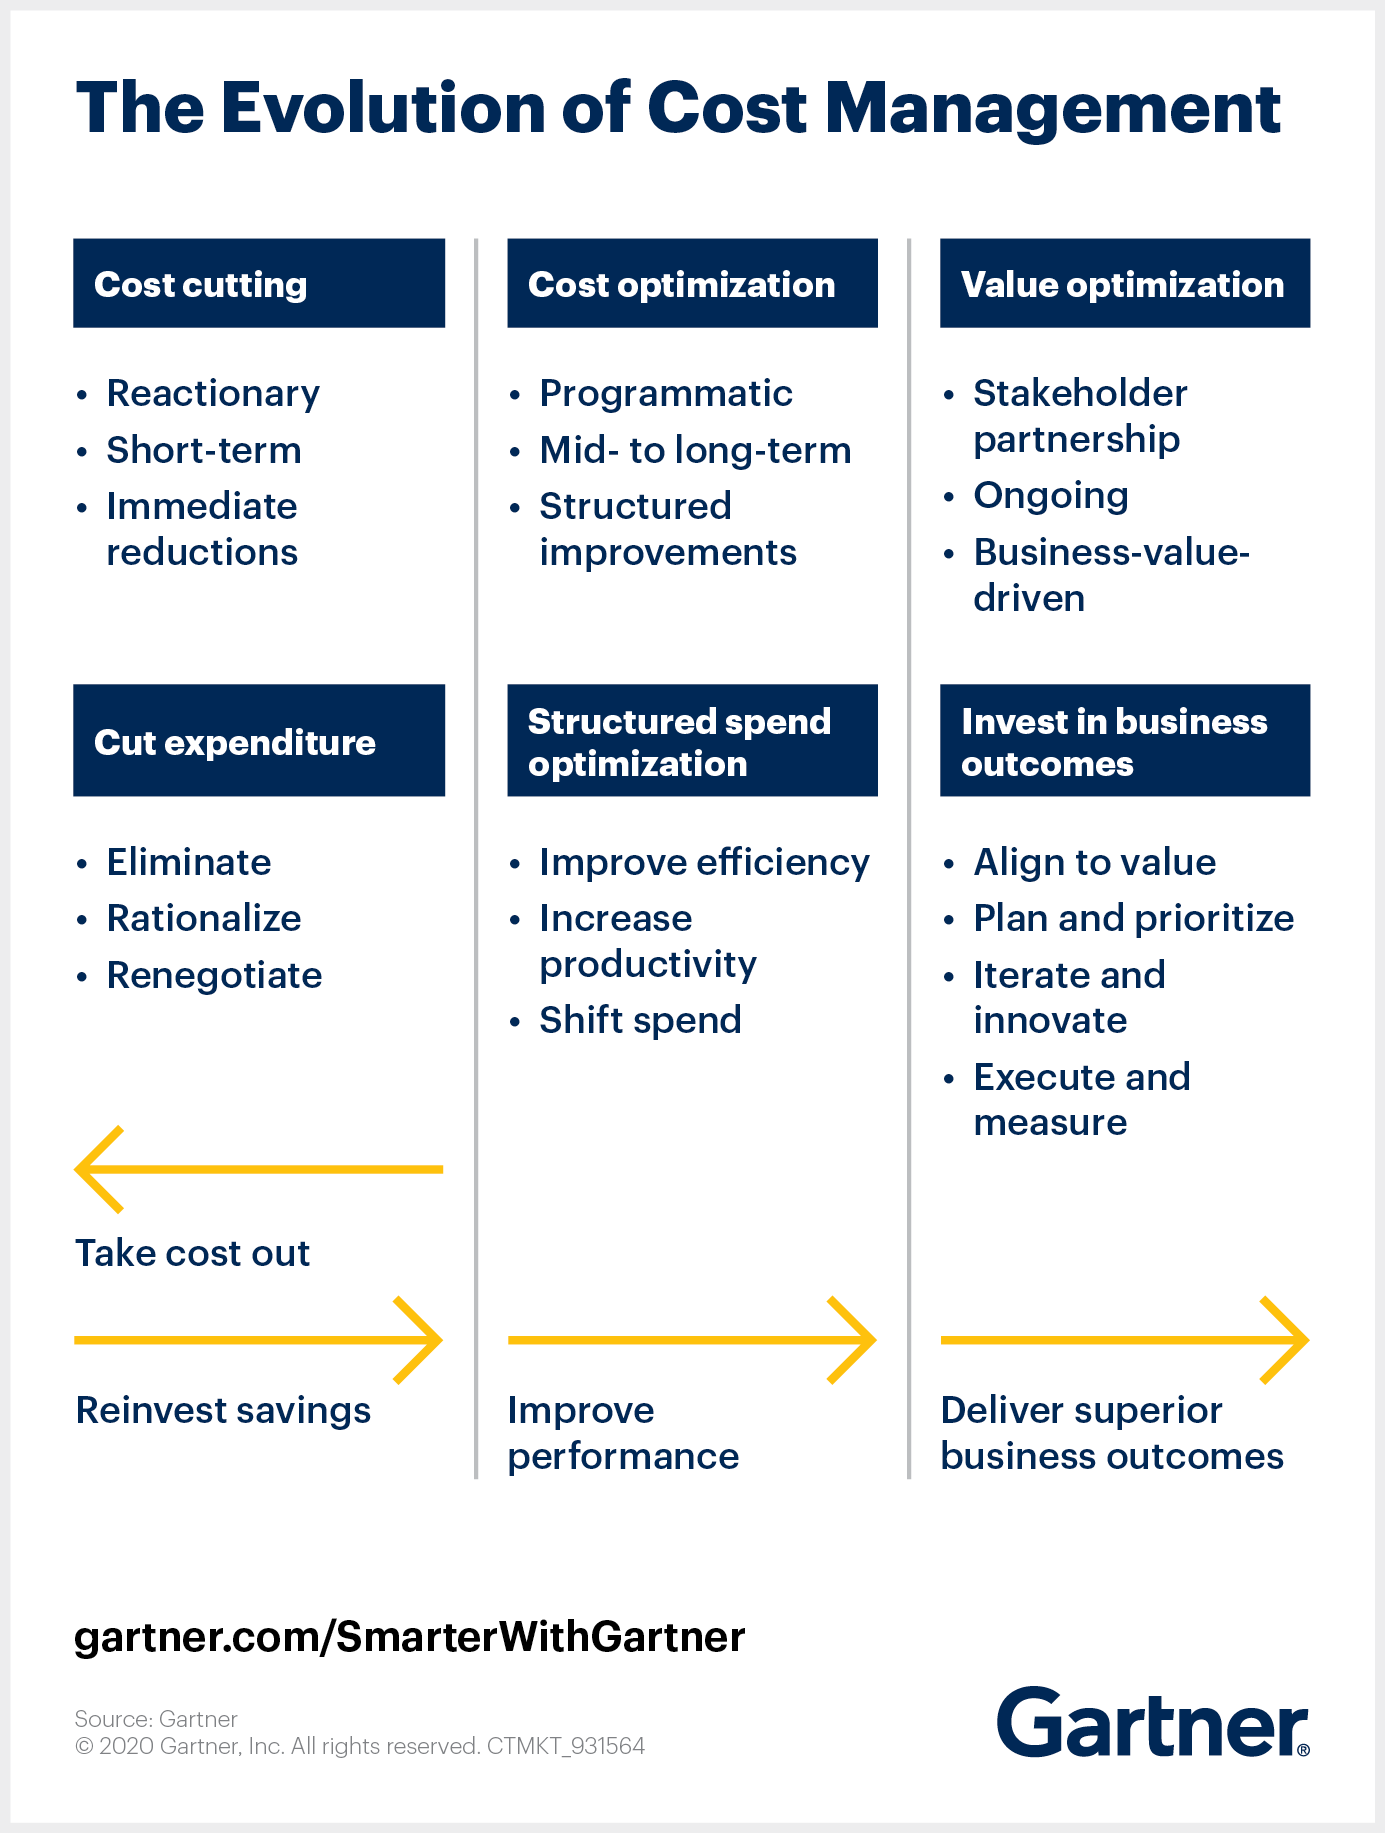 Gartner illustrates the evolution of cost management